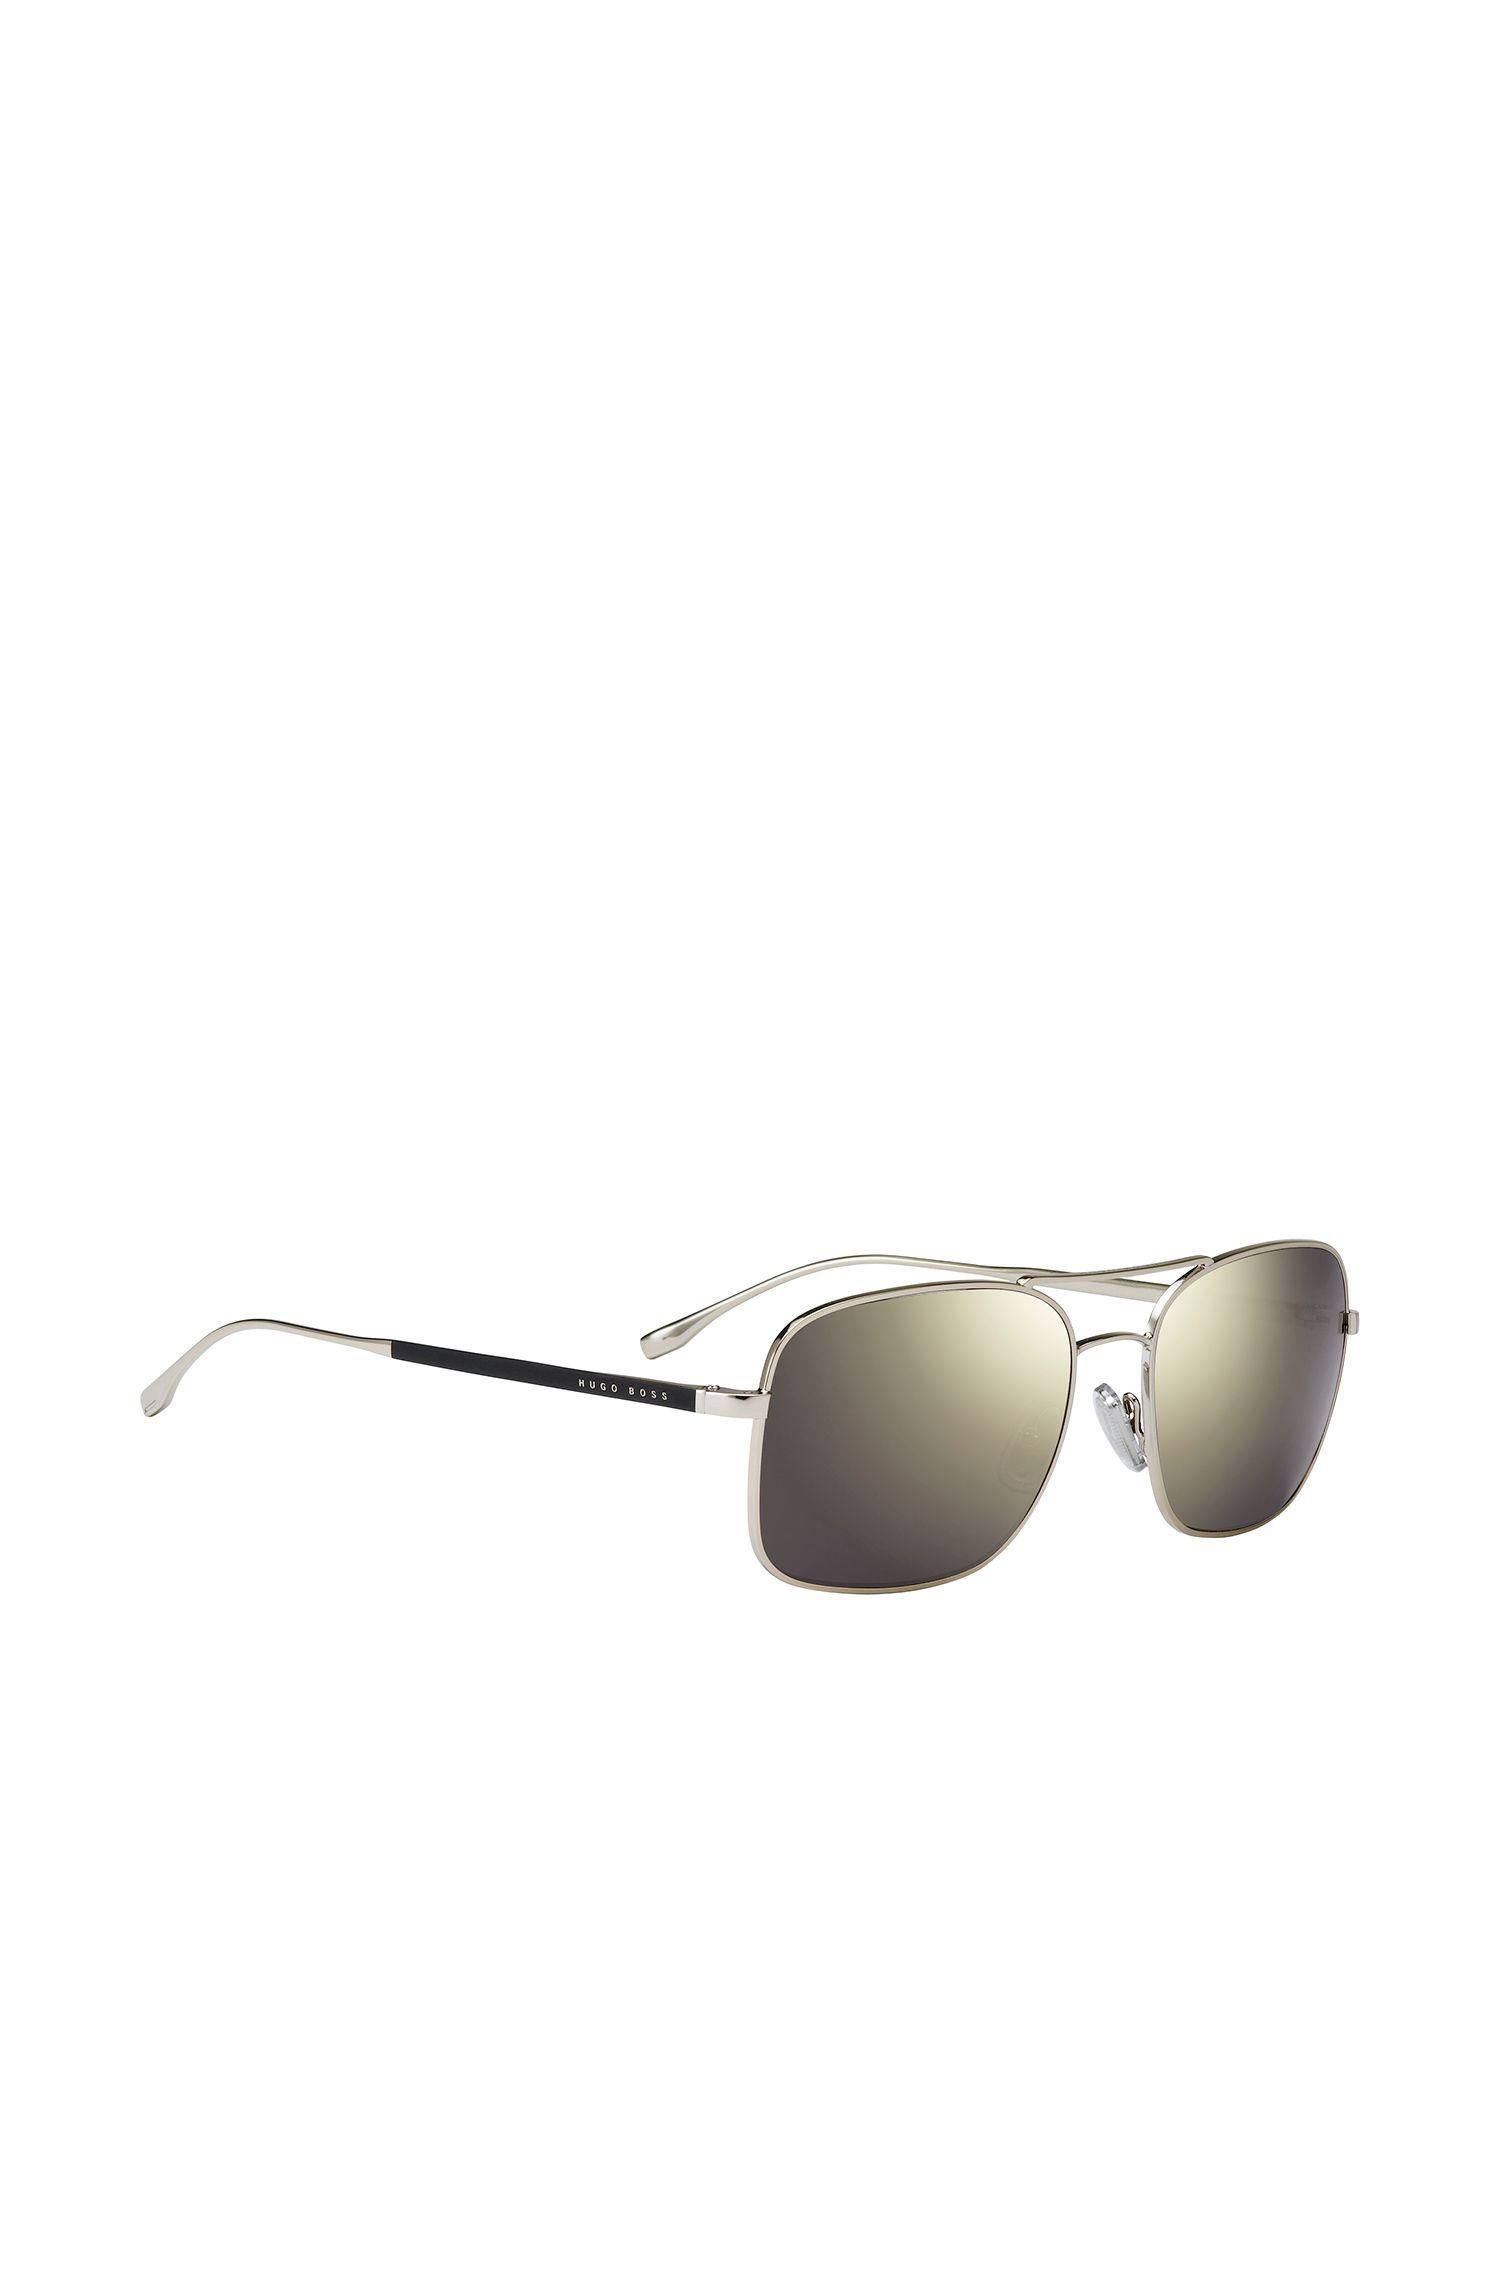 Gunmetal Lens Caravan Sunglasses | BOSS 0781S